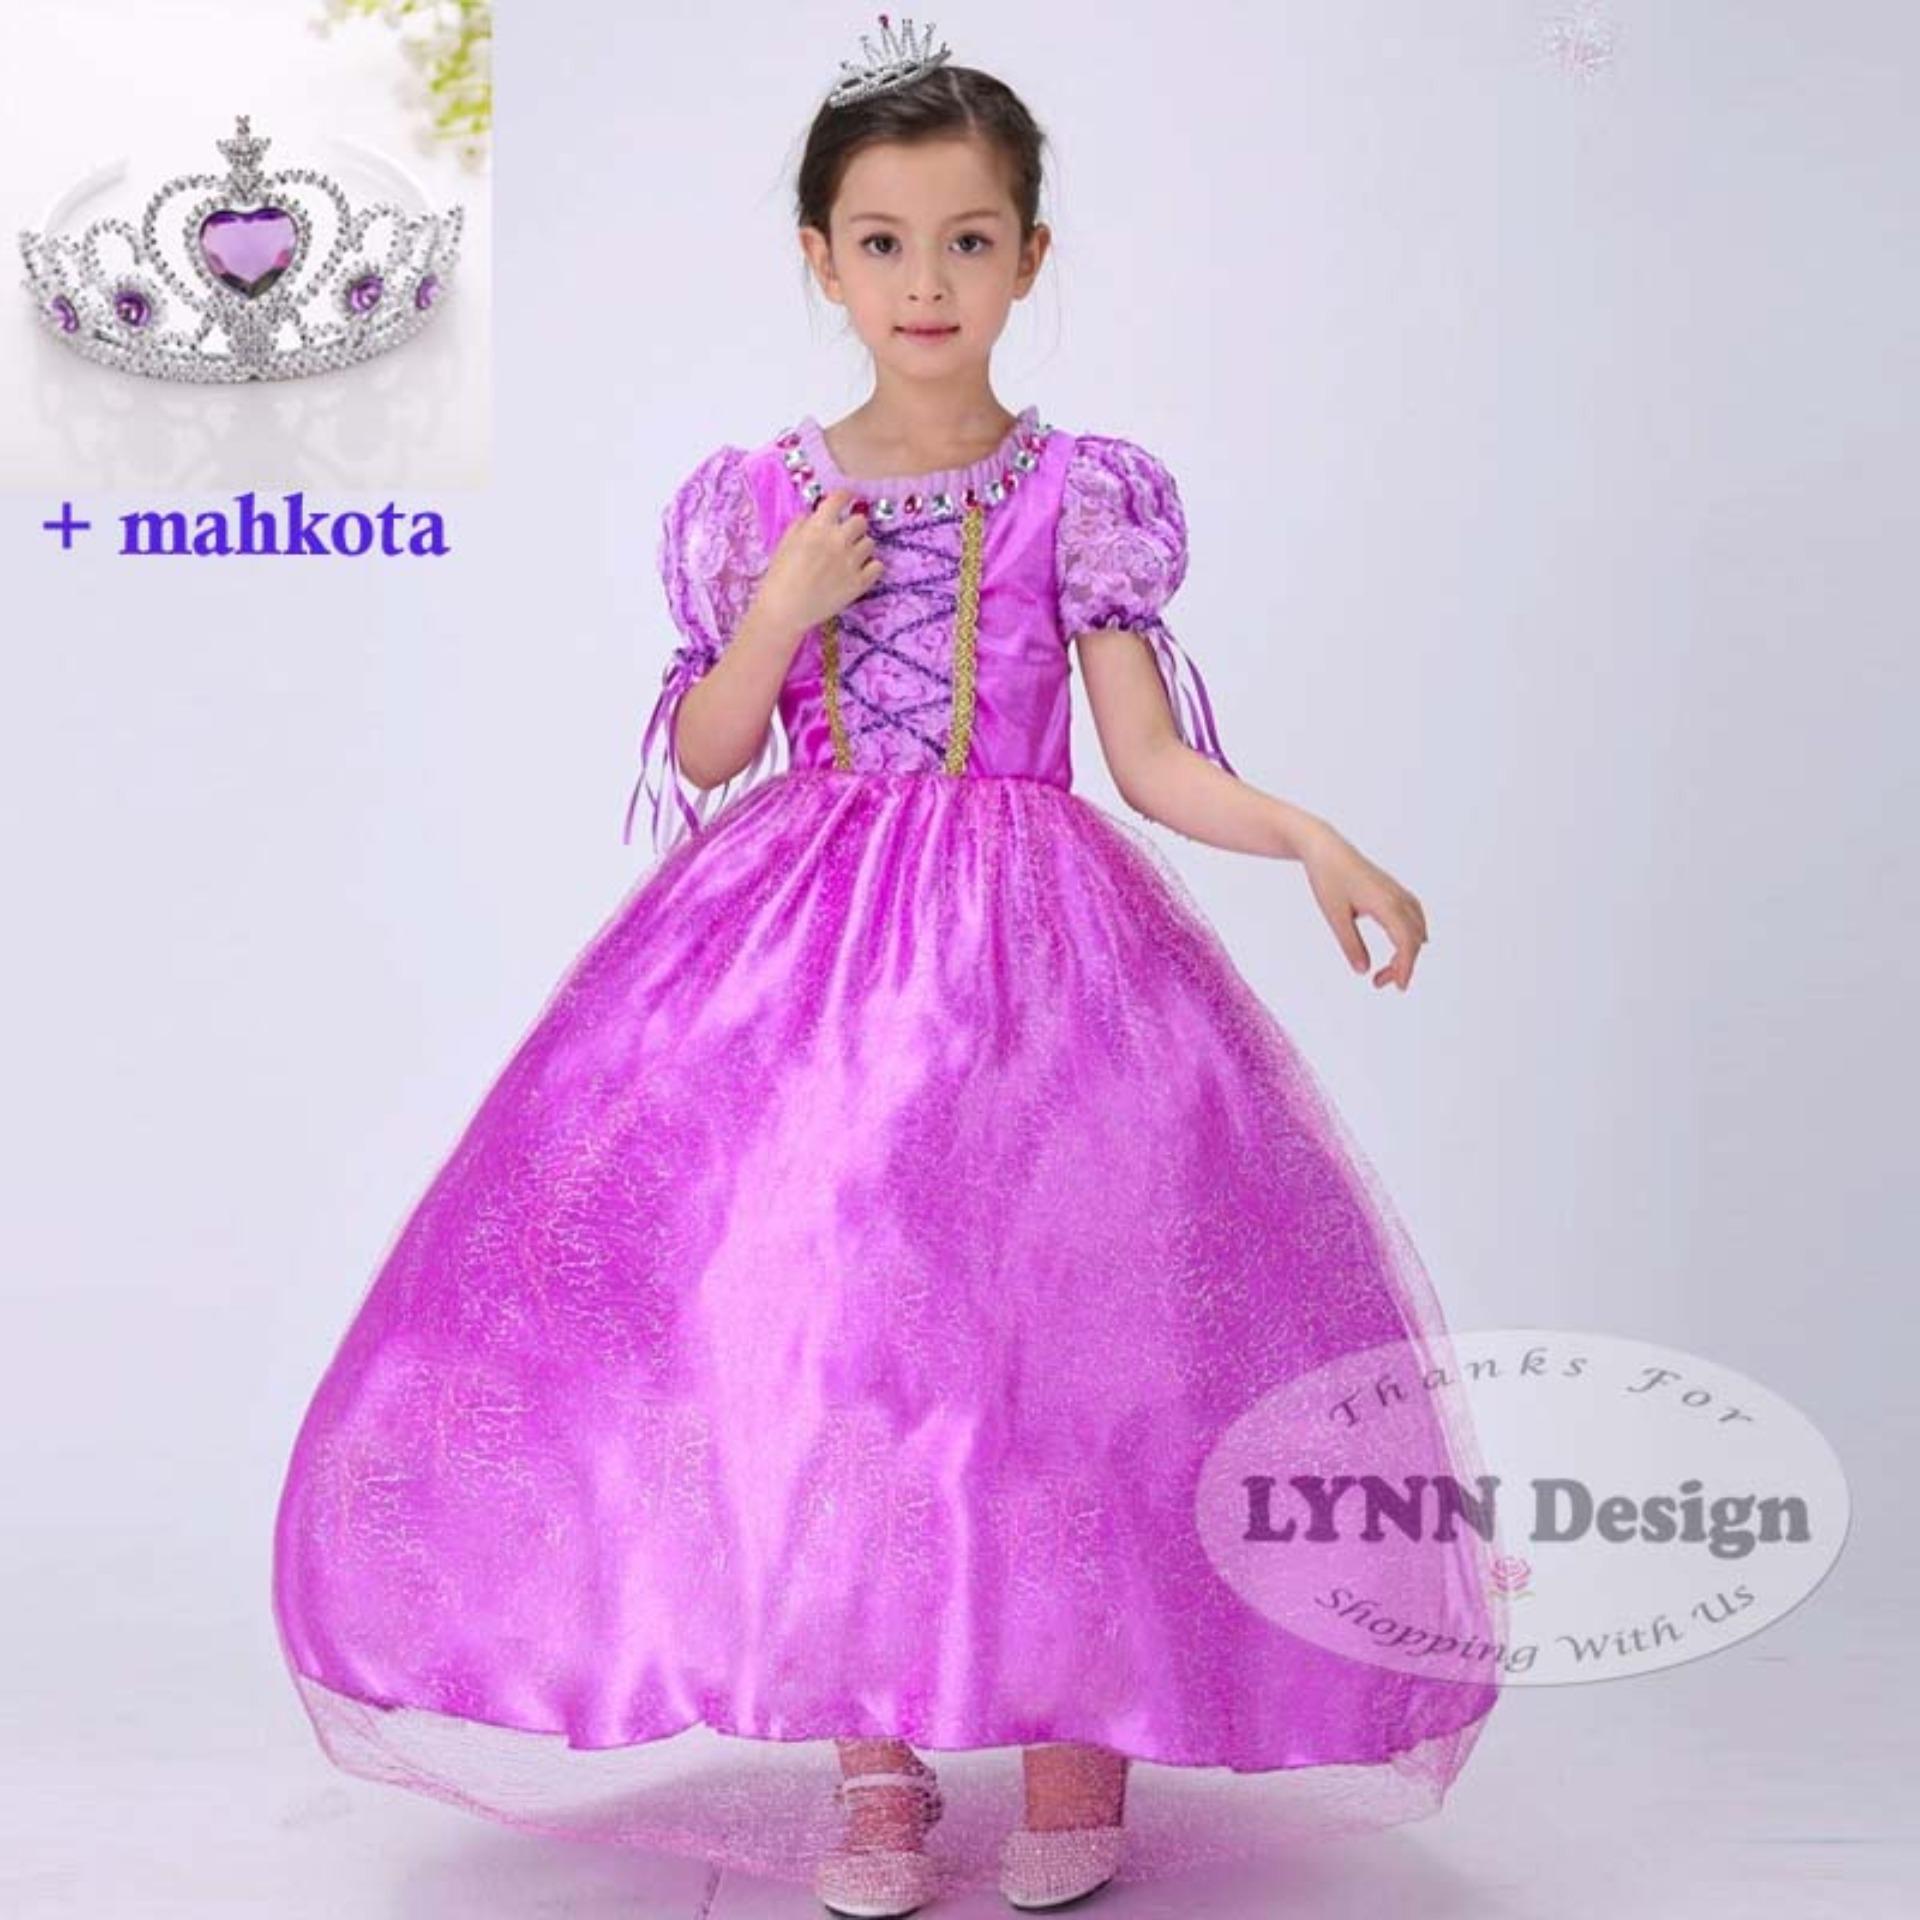 Lynn Design- Baju Dress Gaun Pesta Kostum anak Rapunzel Premium +Mahkota